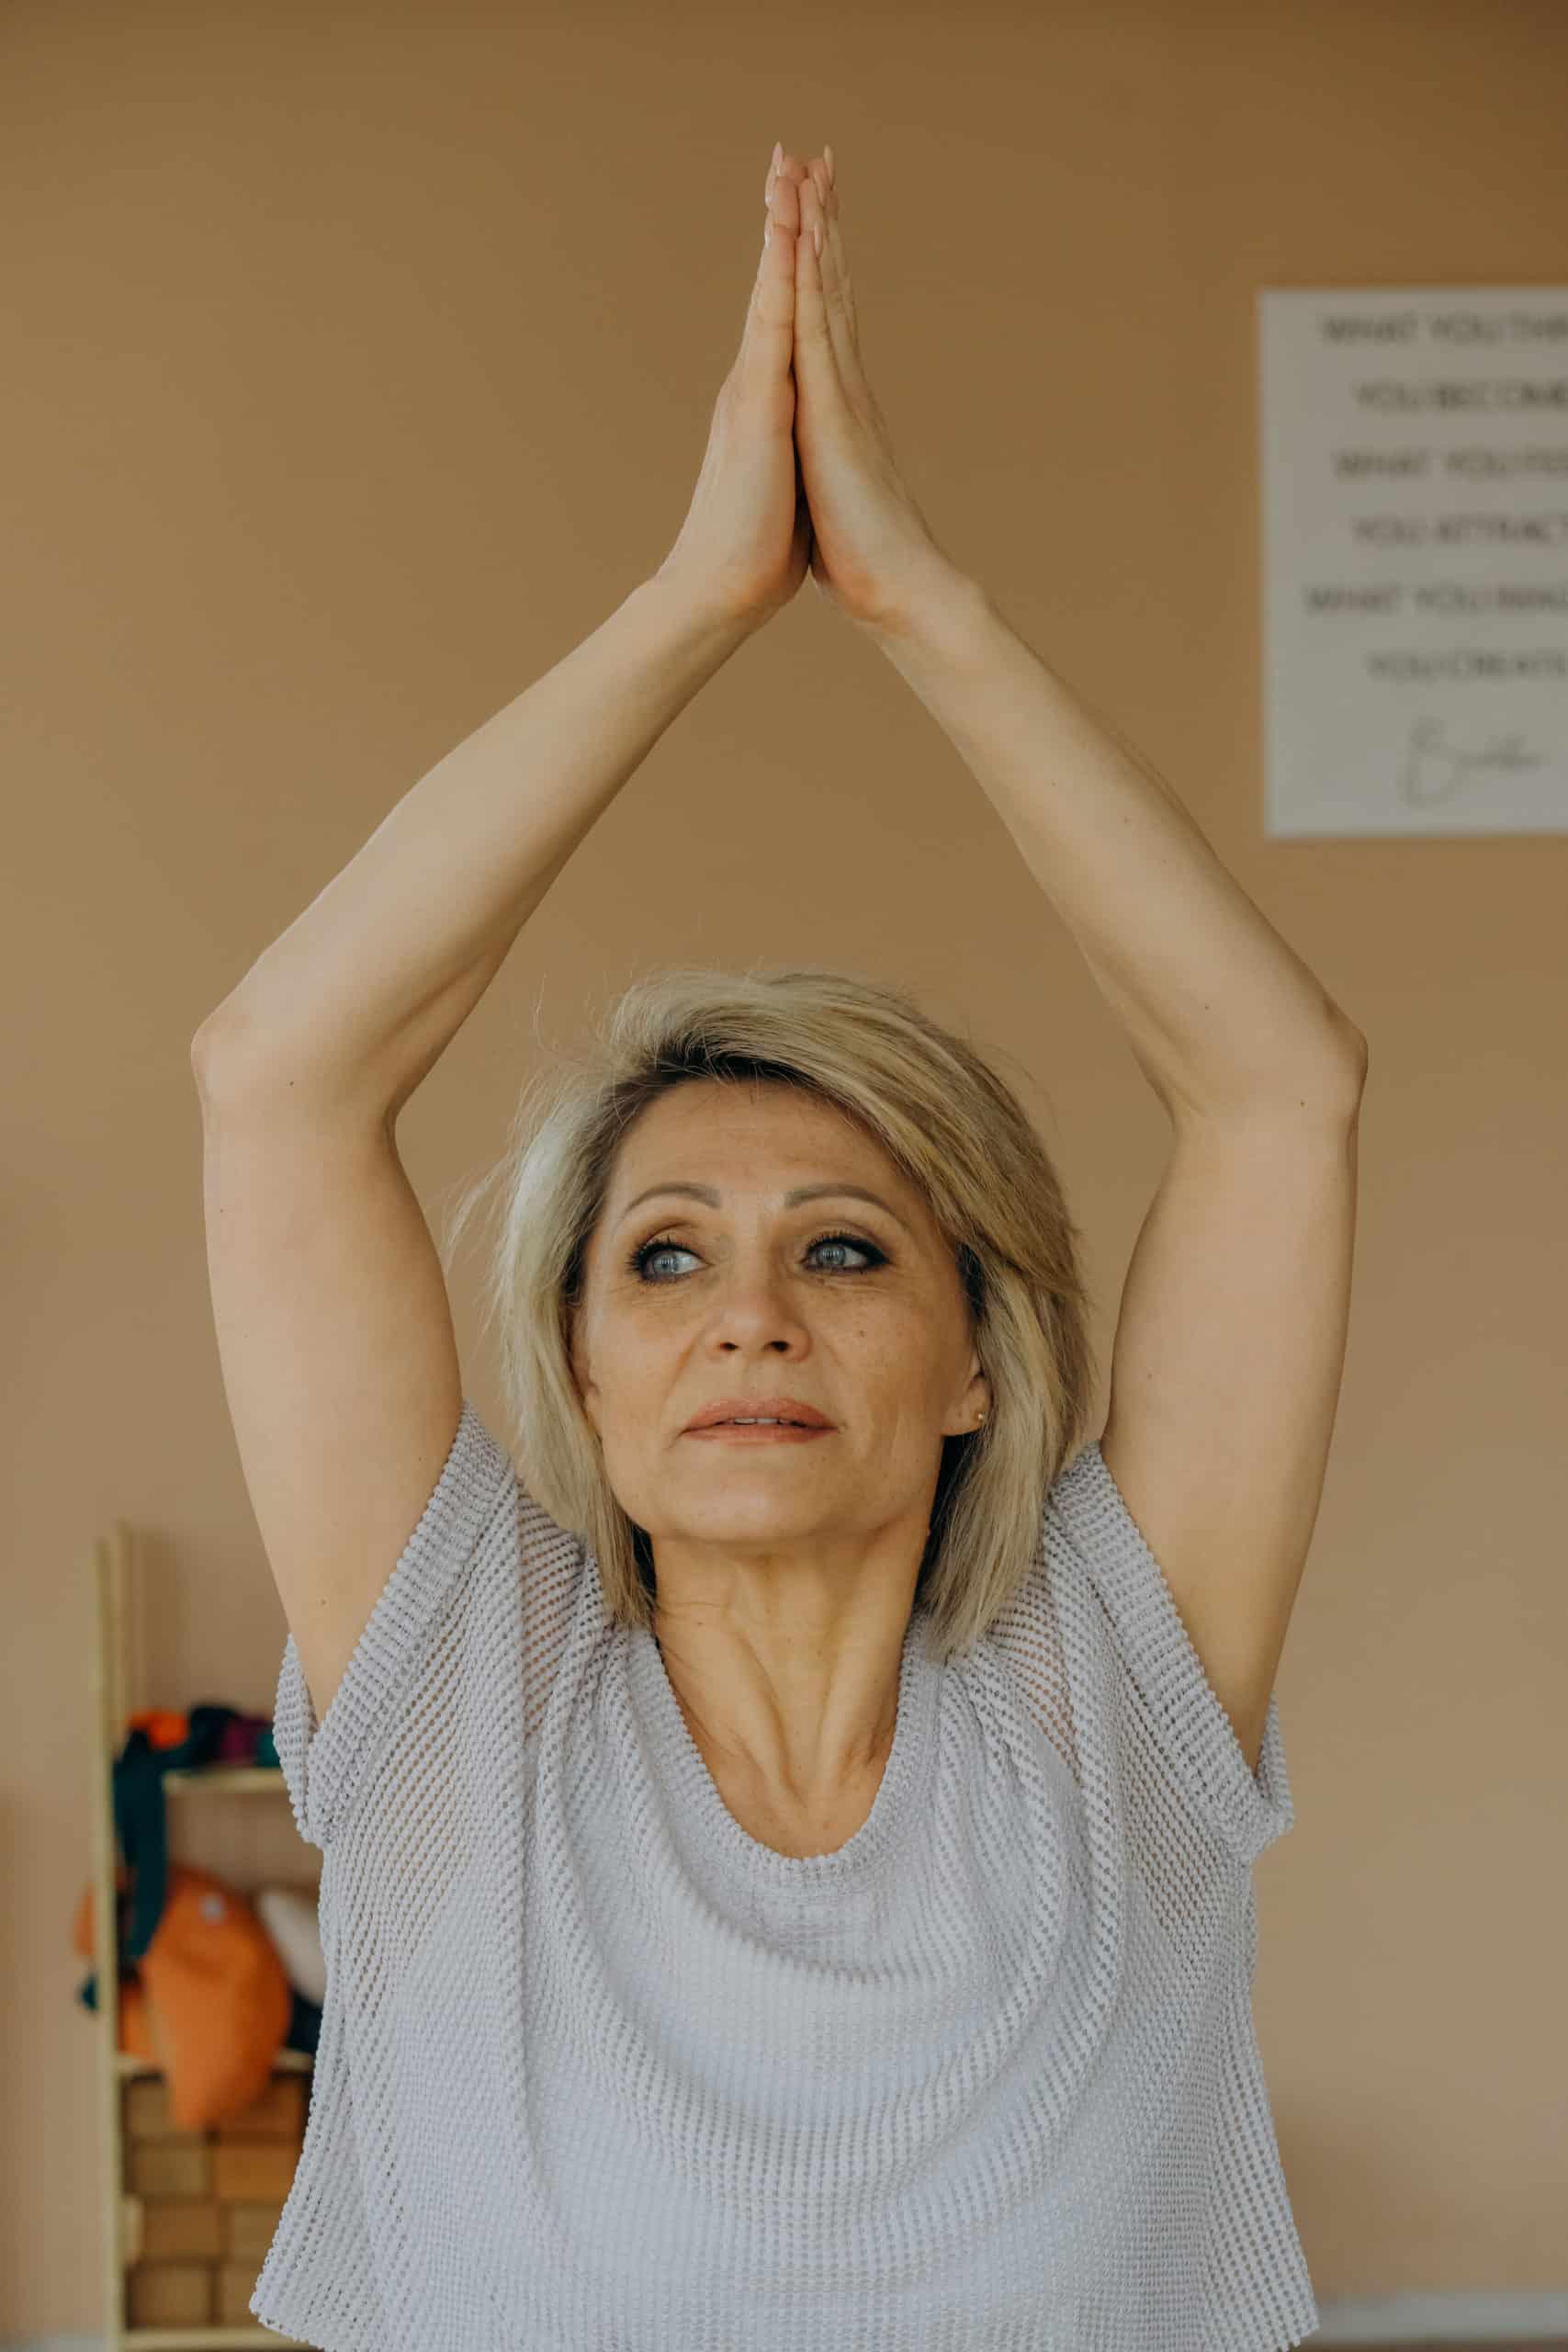 Balance Training Benefits Both Seniors And Caregivers